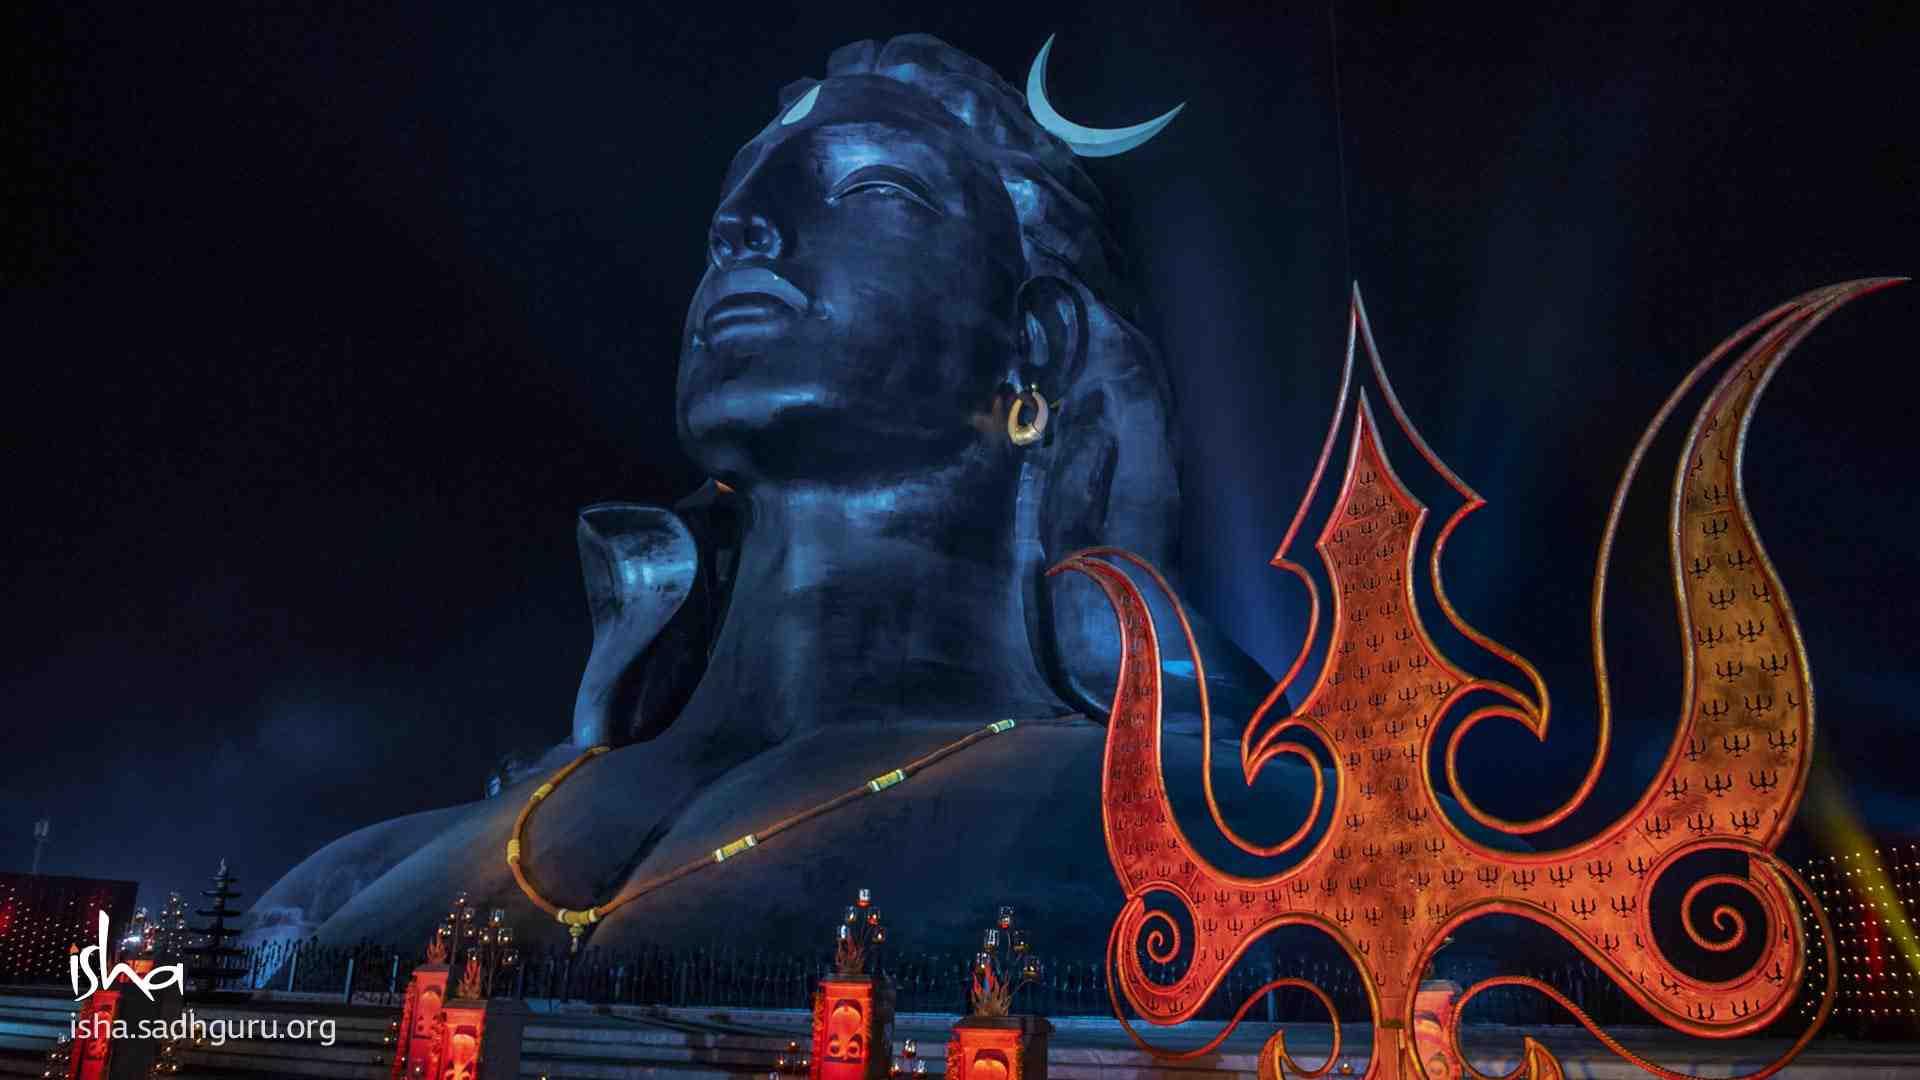 Shiva Wallpaper with his Trishul on Mahashivratri